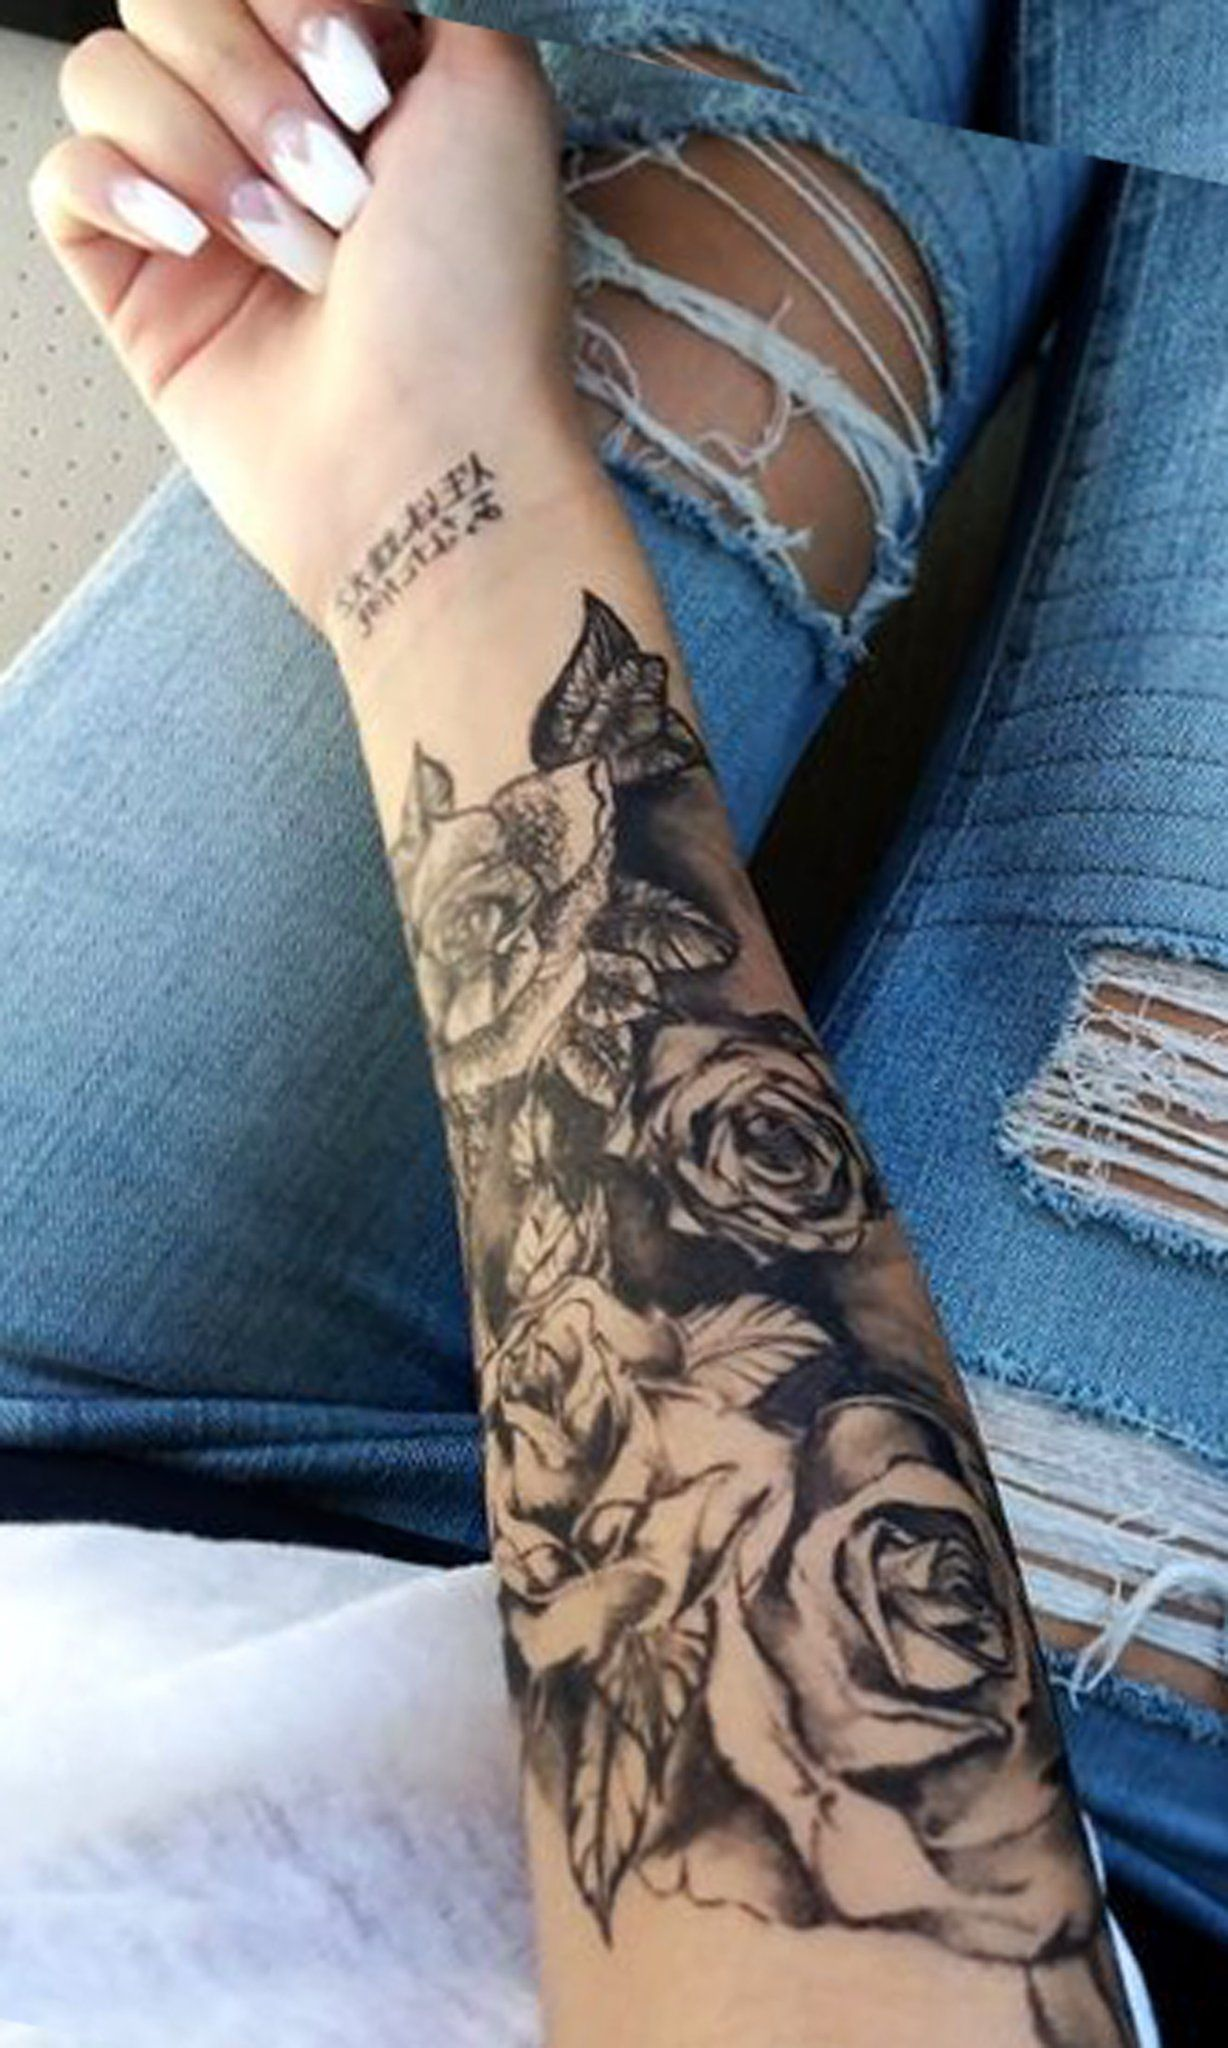 Black Rose Forearm Tattoo Ideas for Women Realistic